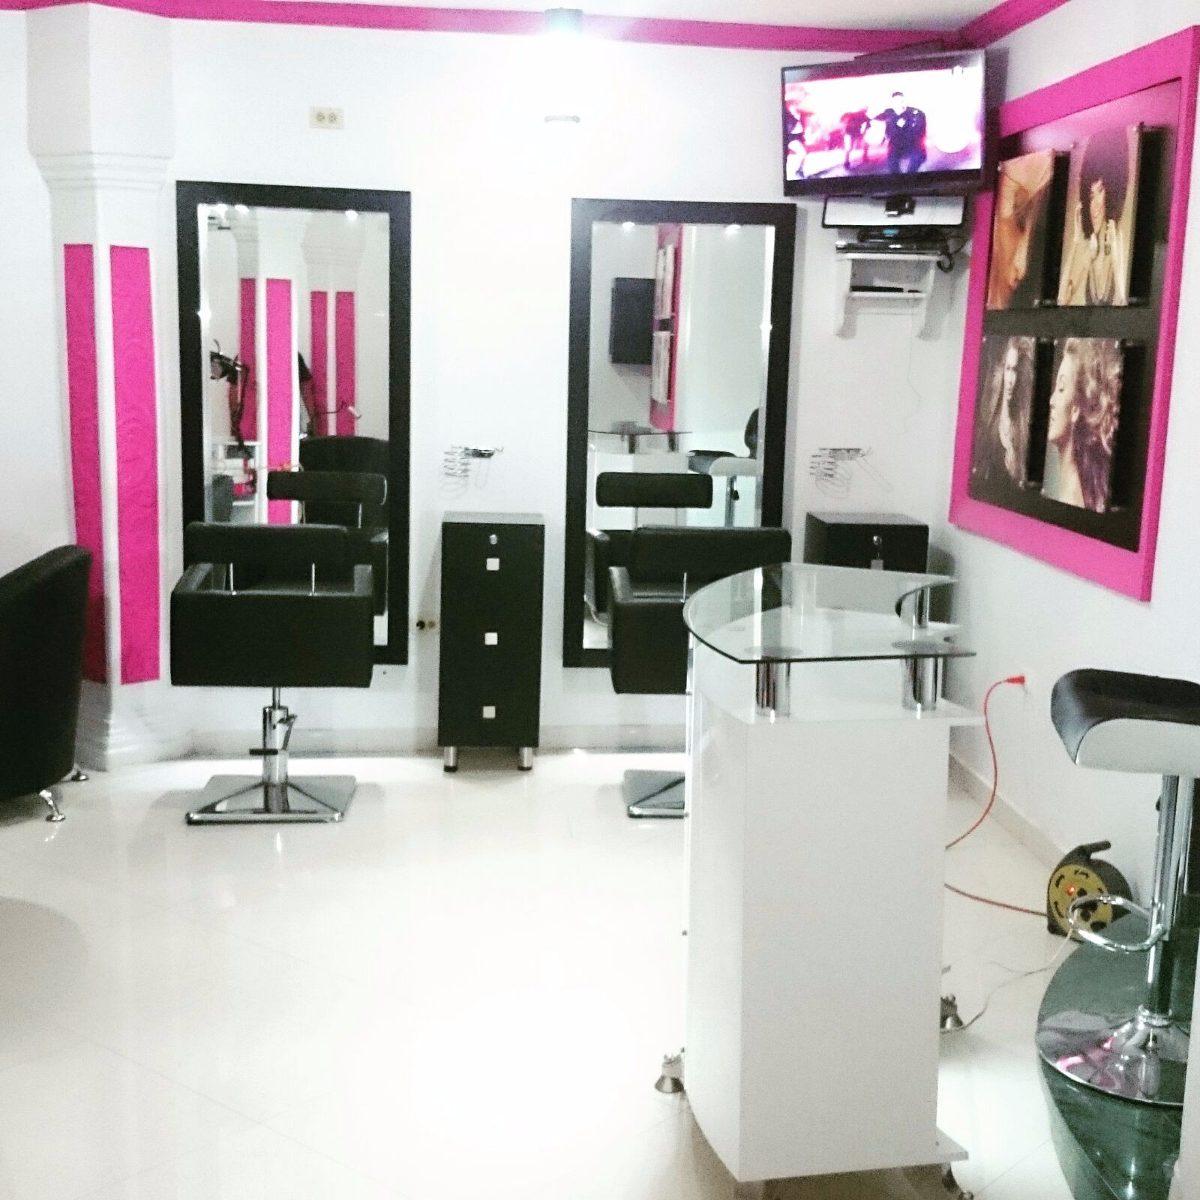 Mobiliario de peluquer as peinadoras entamboradas bs 2 - Como amueblar una peluqueria ...